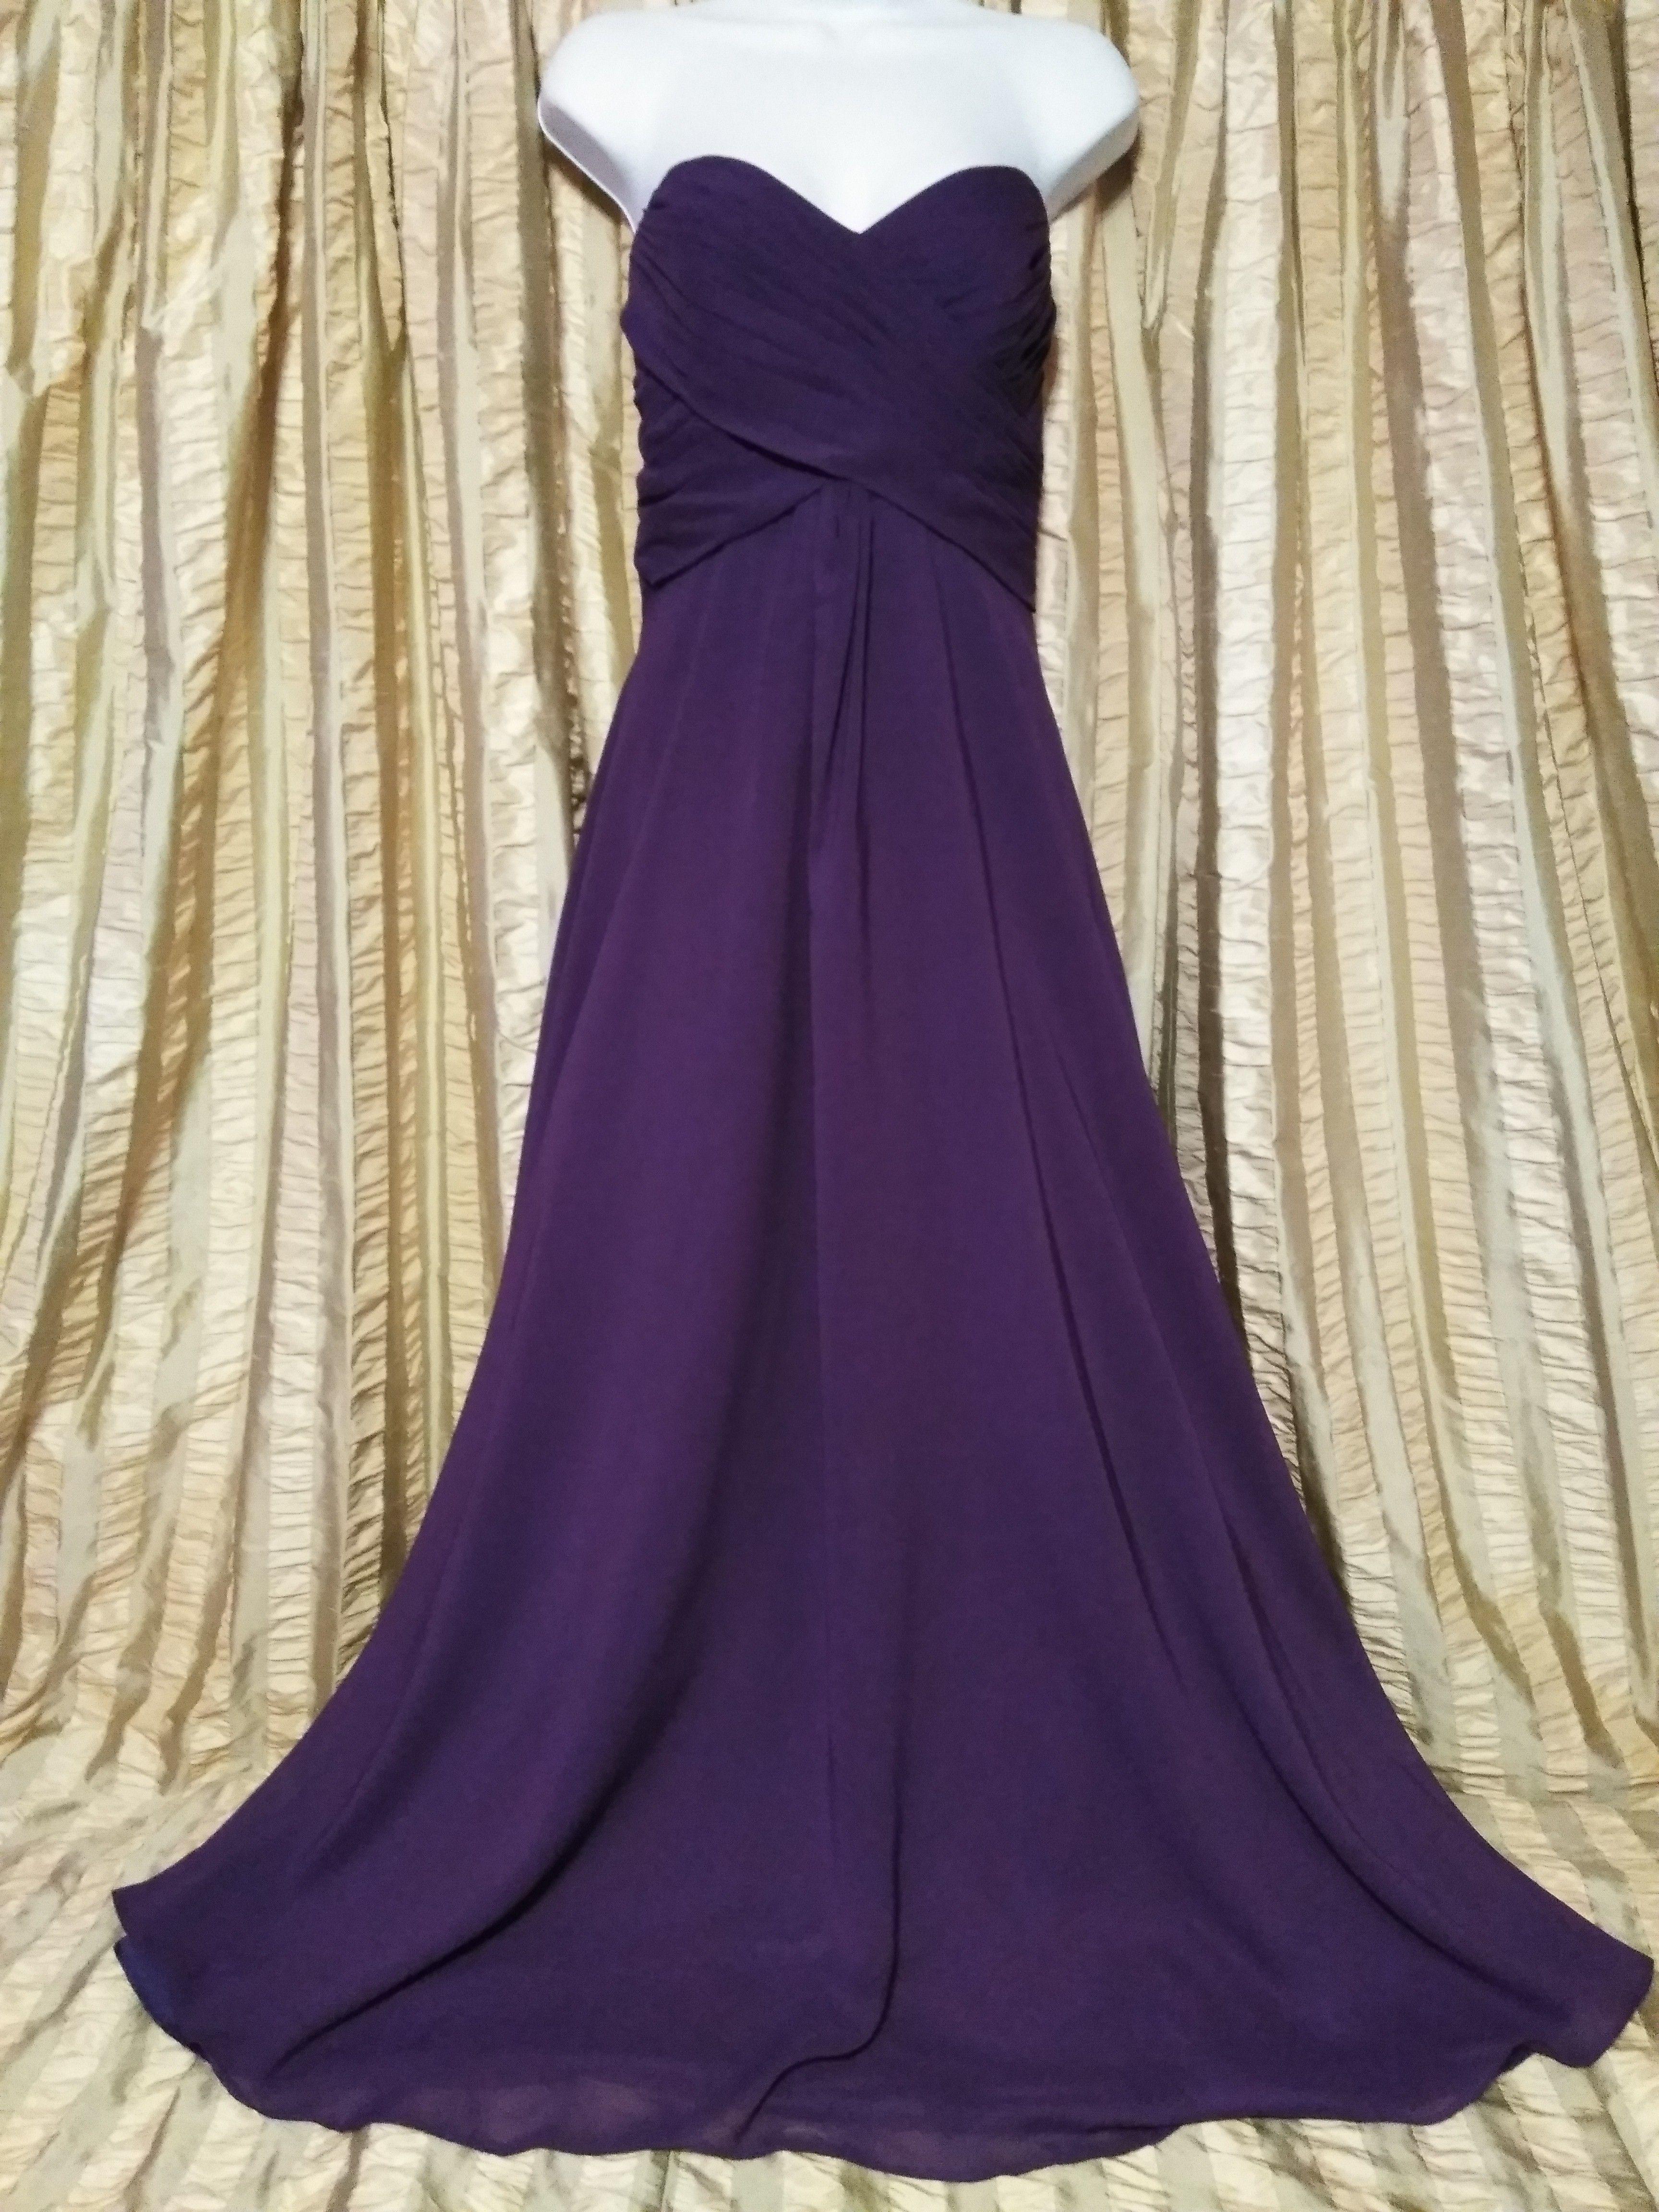 Allure Bridals Formal Purple Strapless Bridesmaid Dress - Size 12 ...